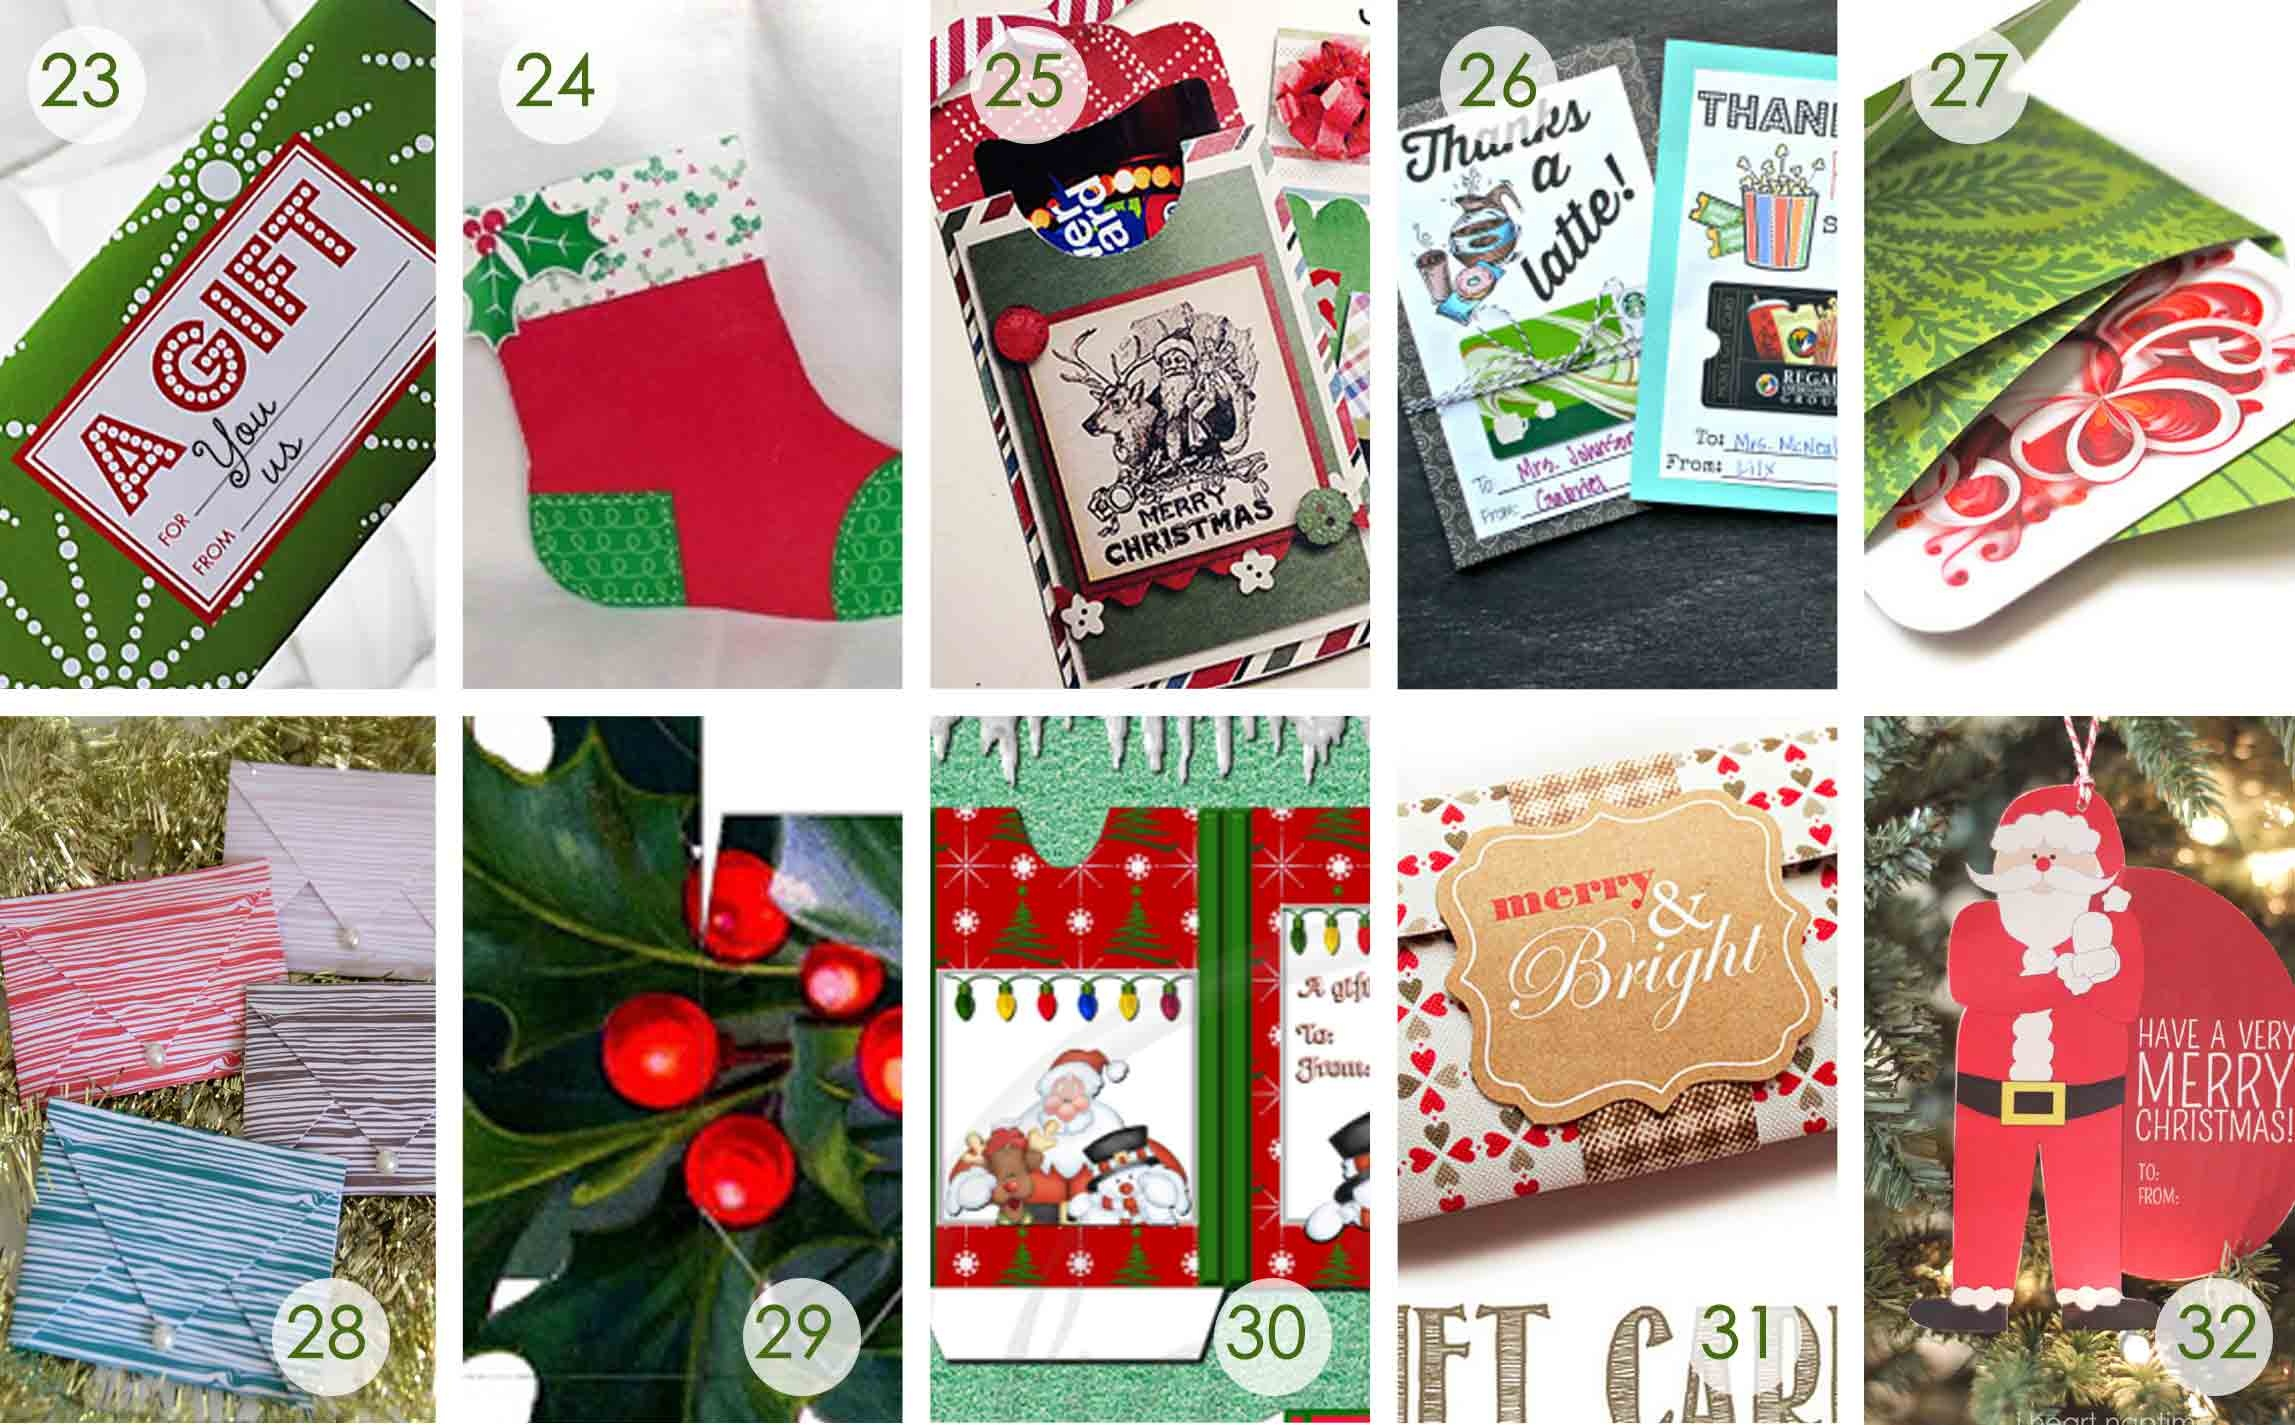 Over 50 Printable Gift Card Holders For The Holidays   Gcg - Free Printable Christmas Money Holder Cards